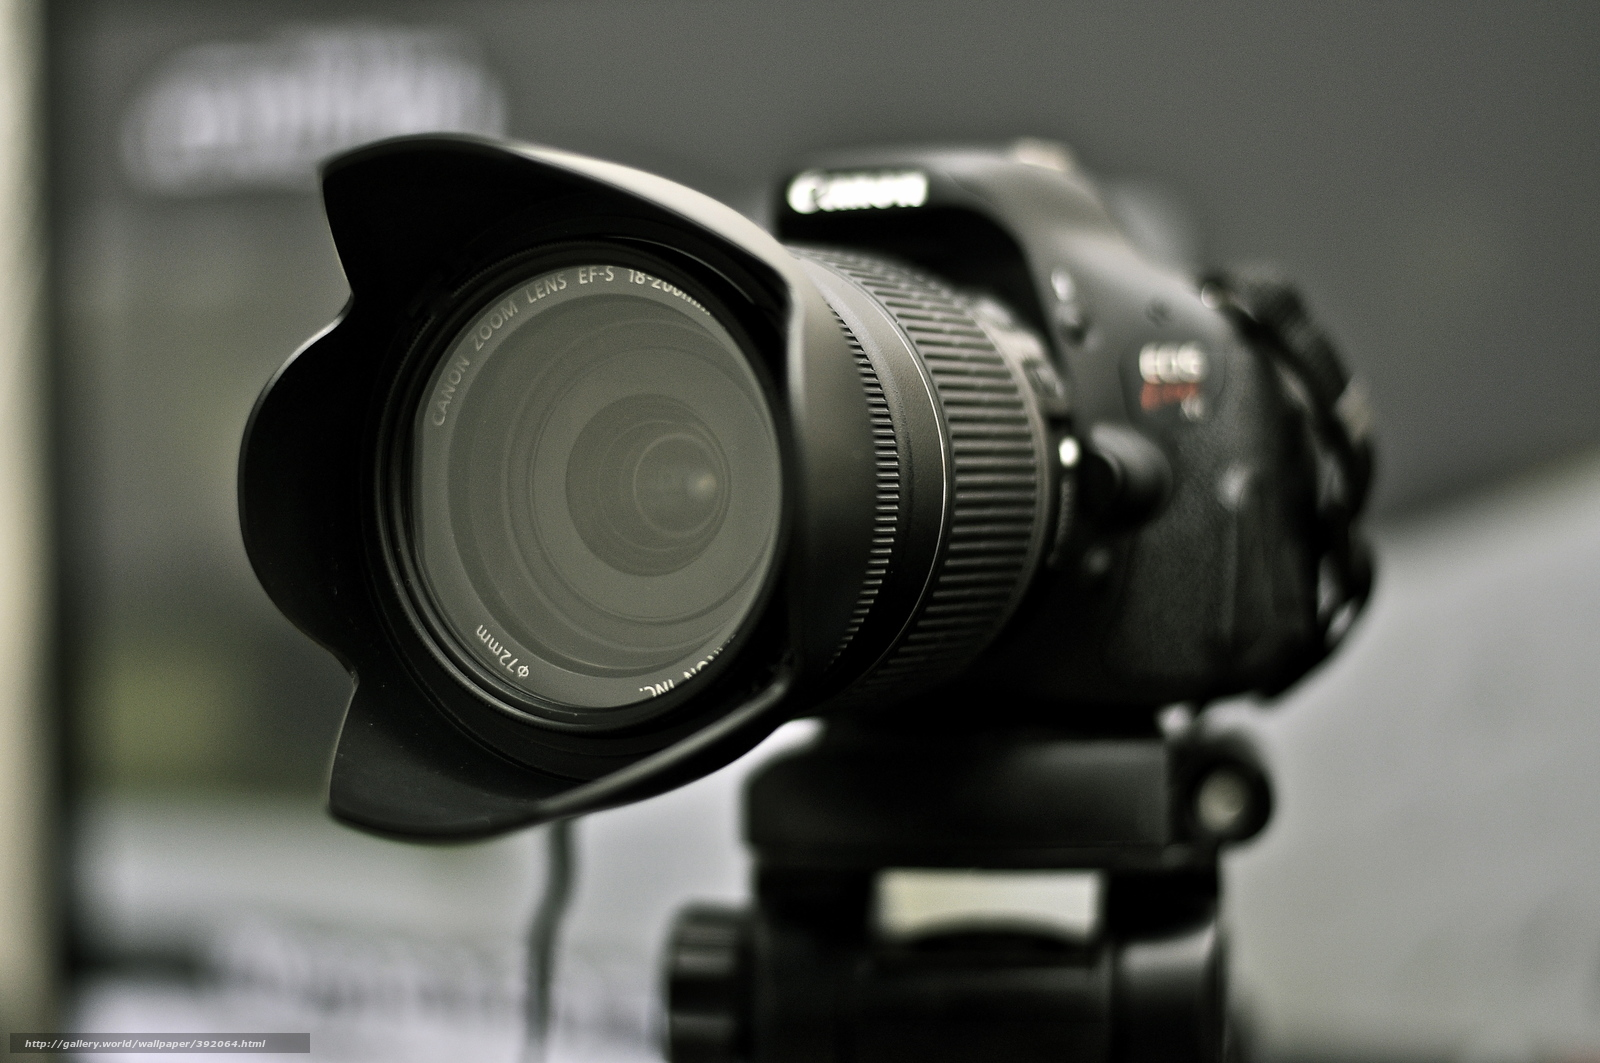 Tlcharger fond d 39 ecran canon appareil photo lentille for Ecran appareil photo